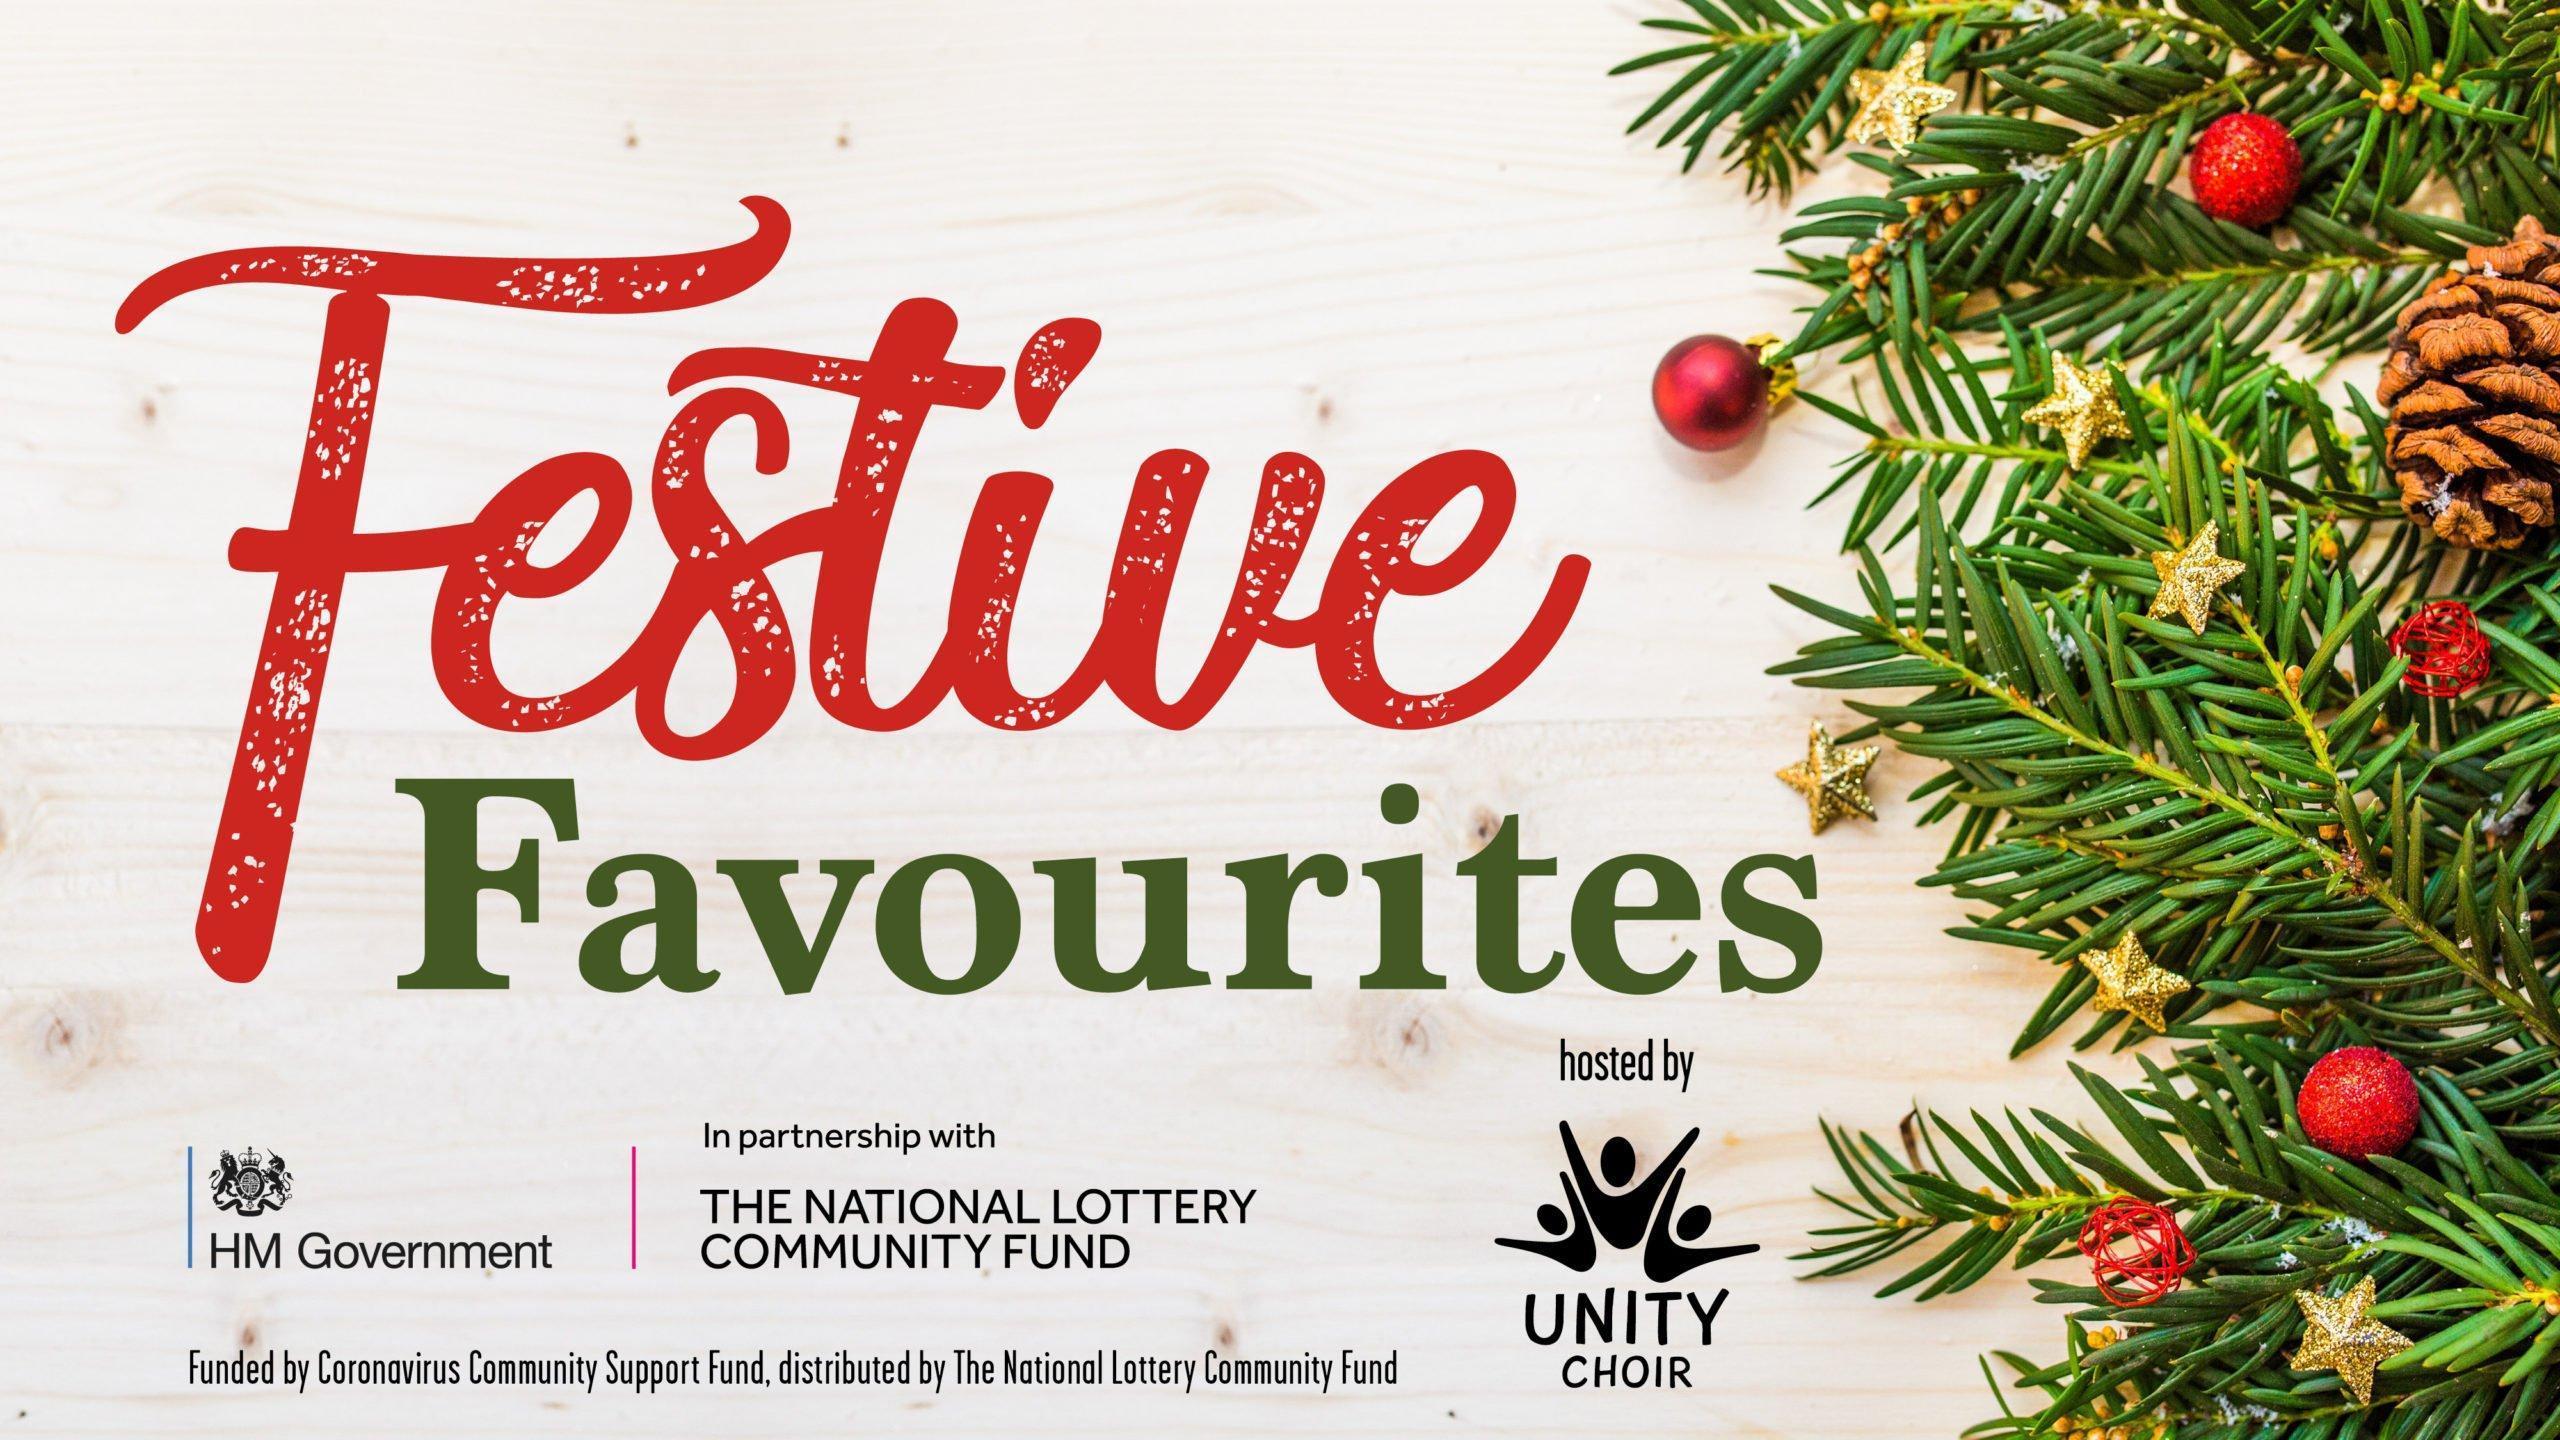 Festive-Favourties-FB-Event